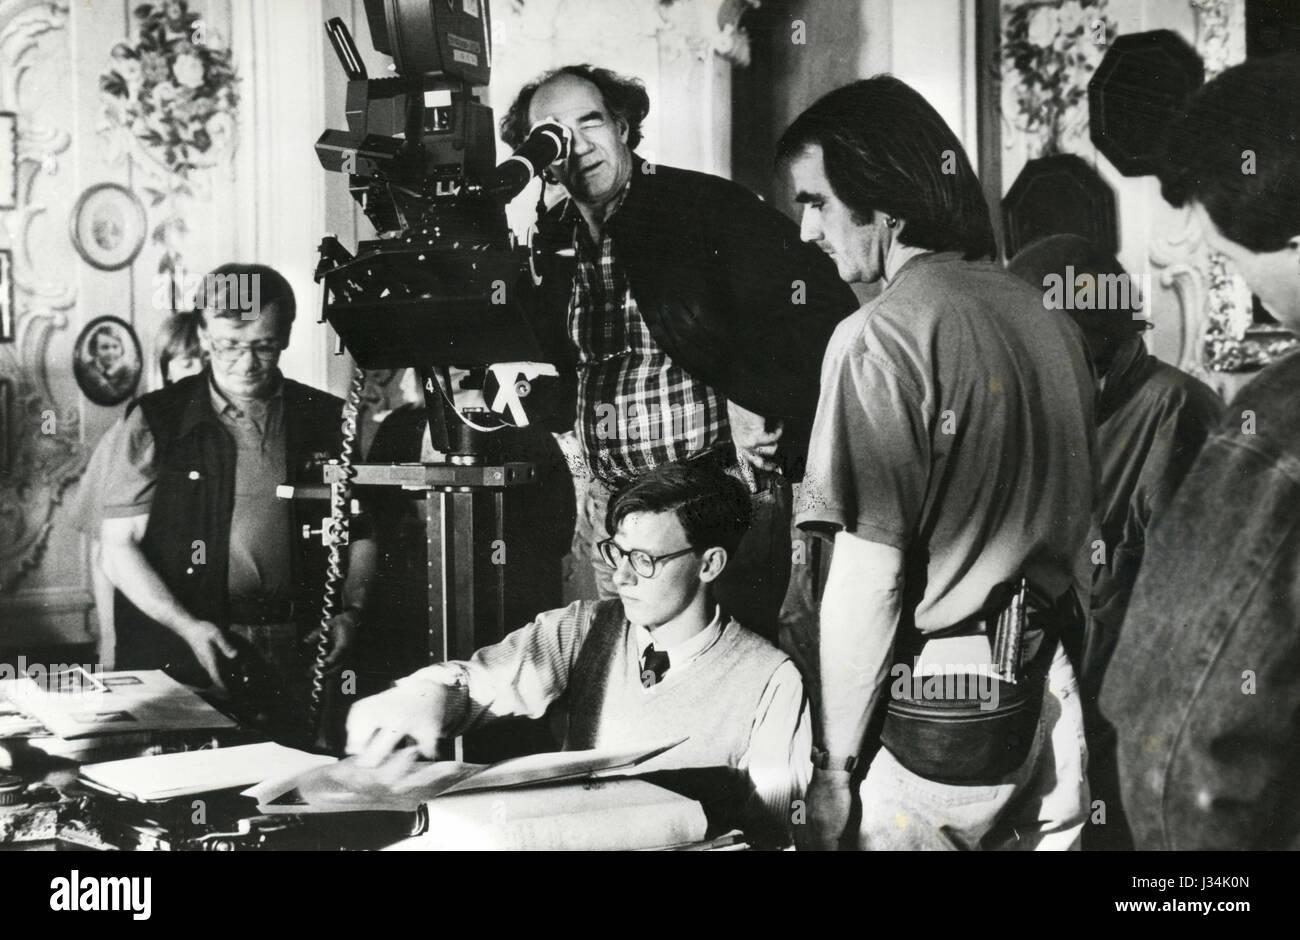 Movie director George Sluizer on the set of Utz, 1992 - Stock Image